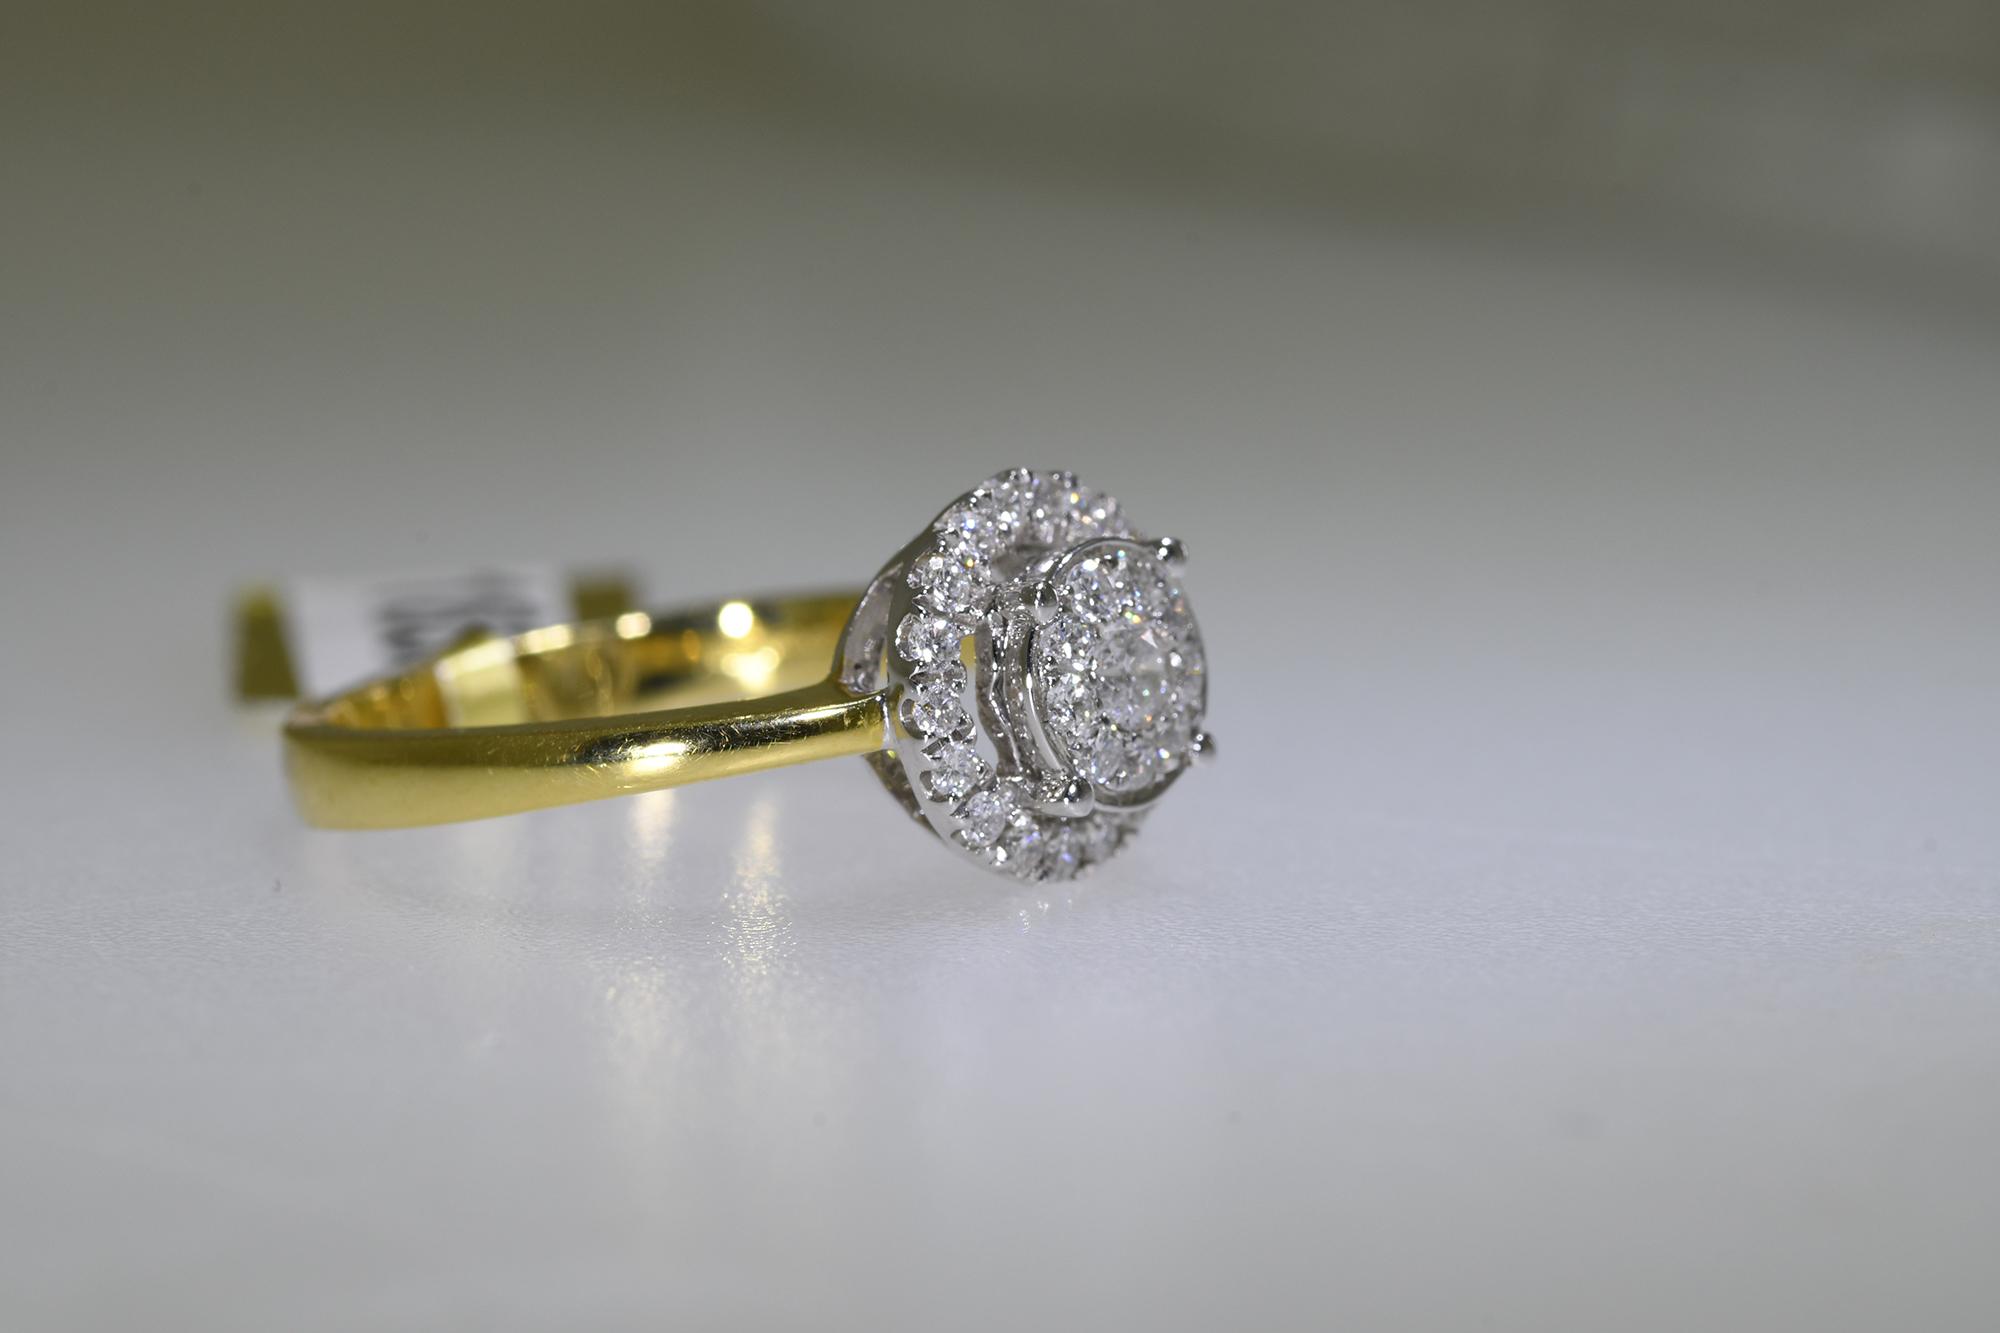 Diamond Ring - Image 2 of 2